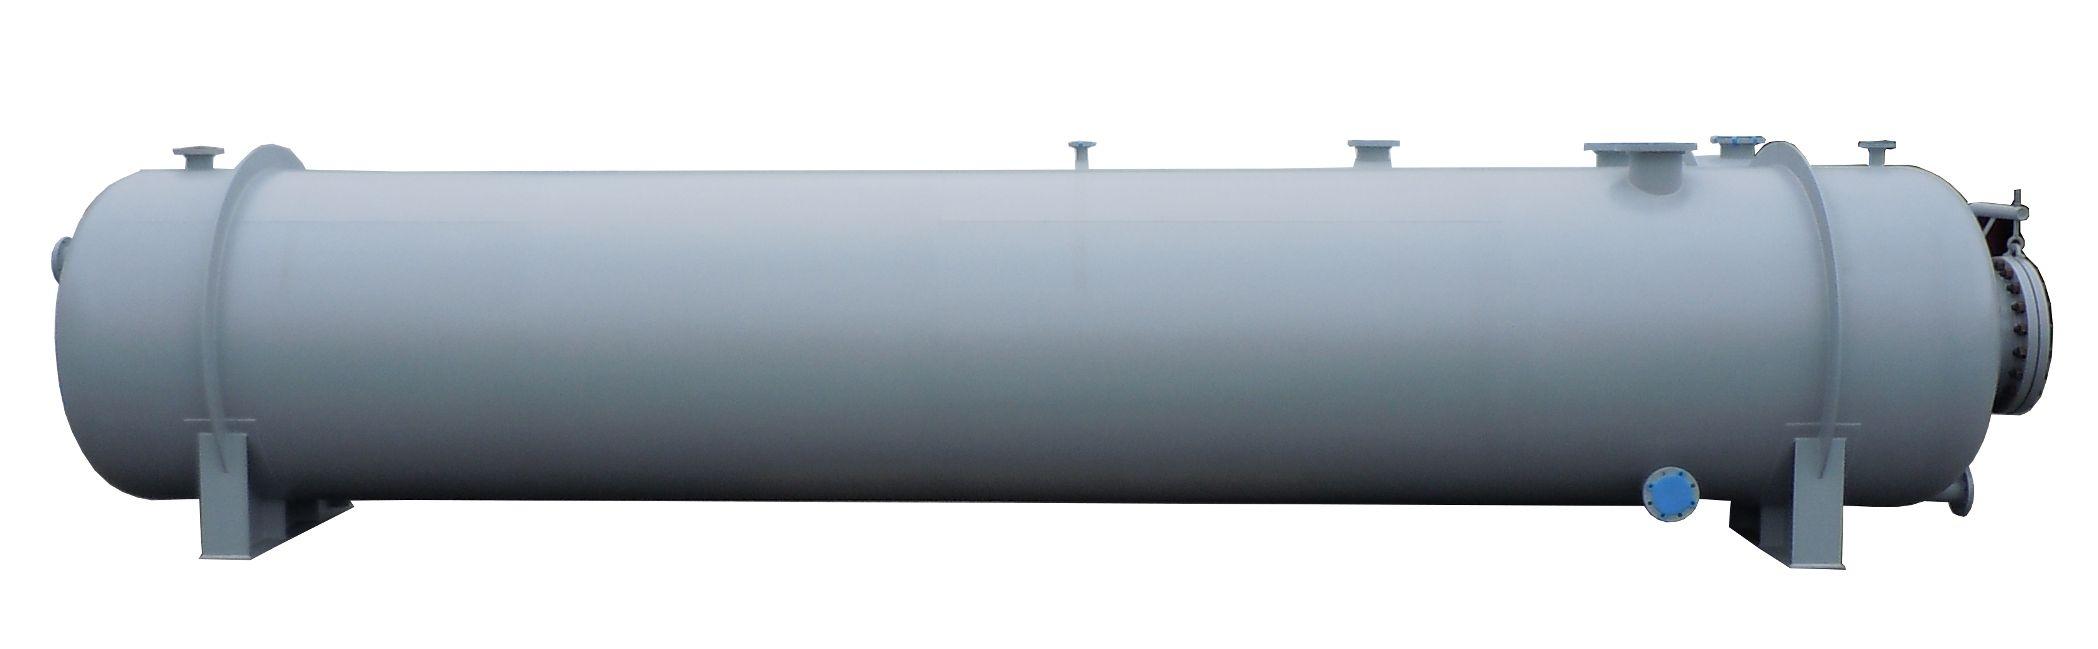 4000 Gallon Water Cistern Tank_BEPeterson